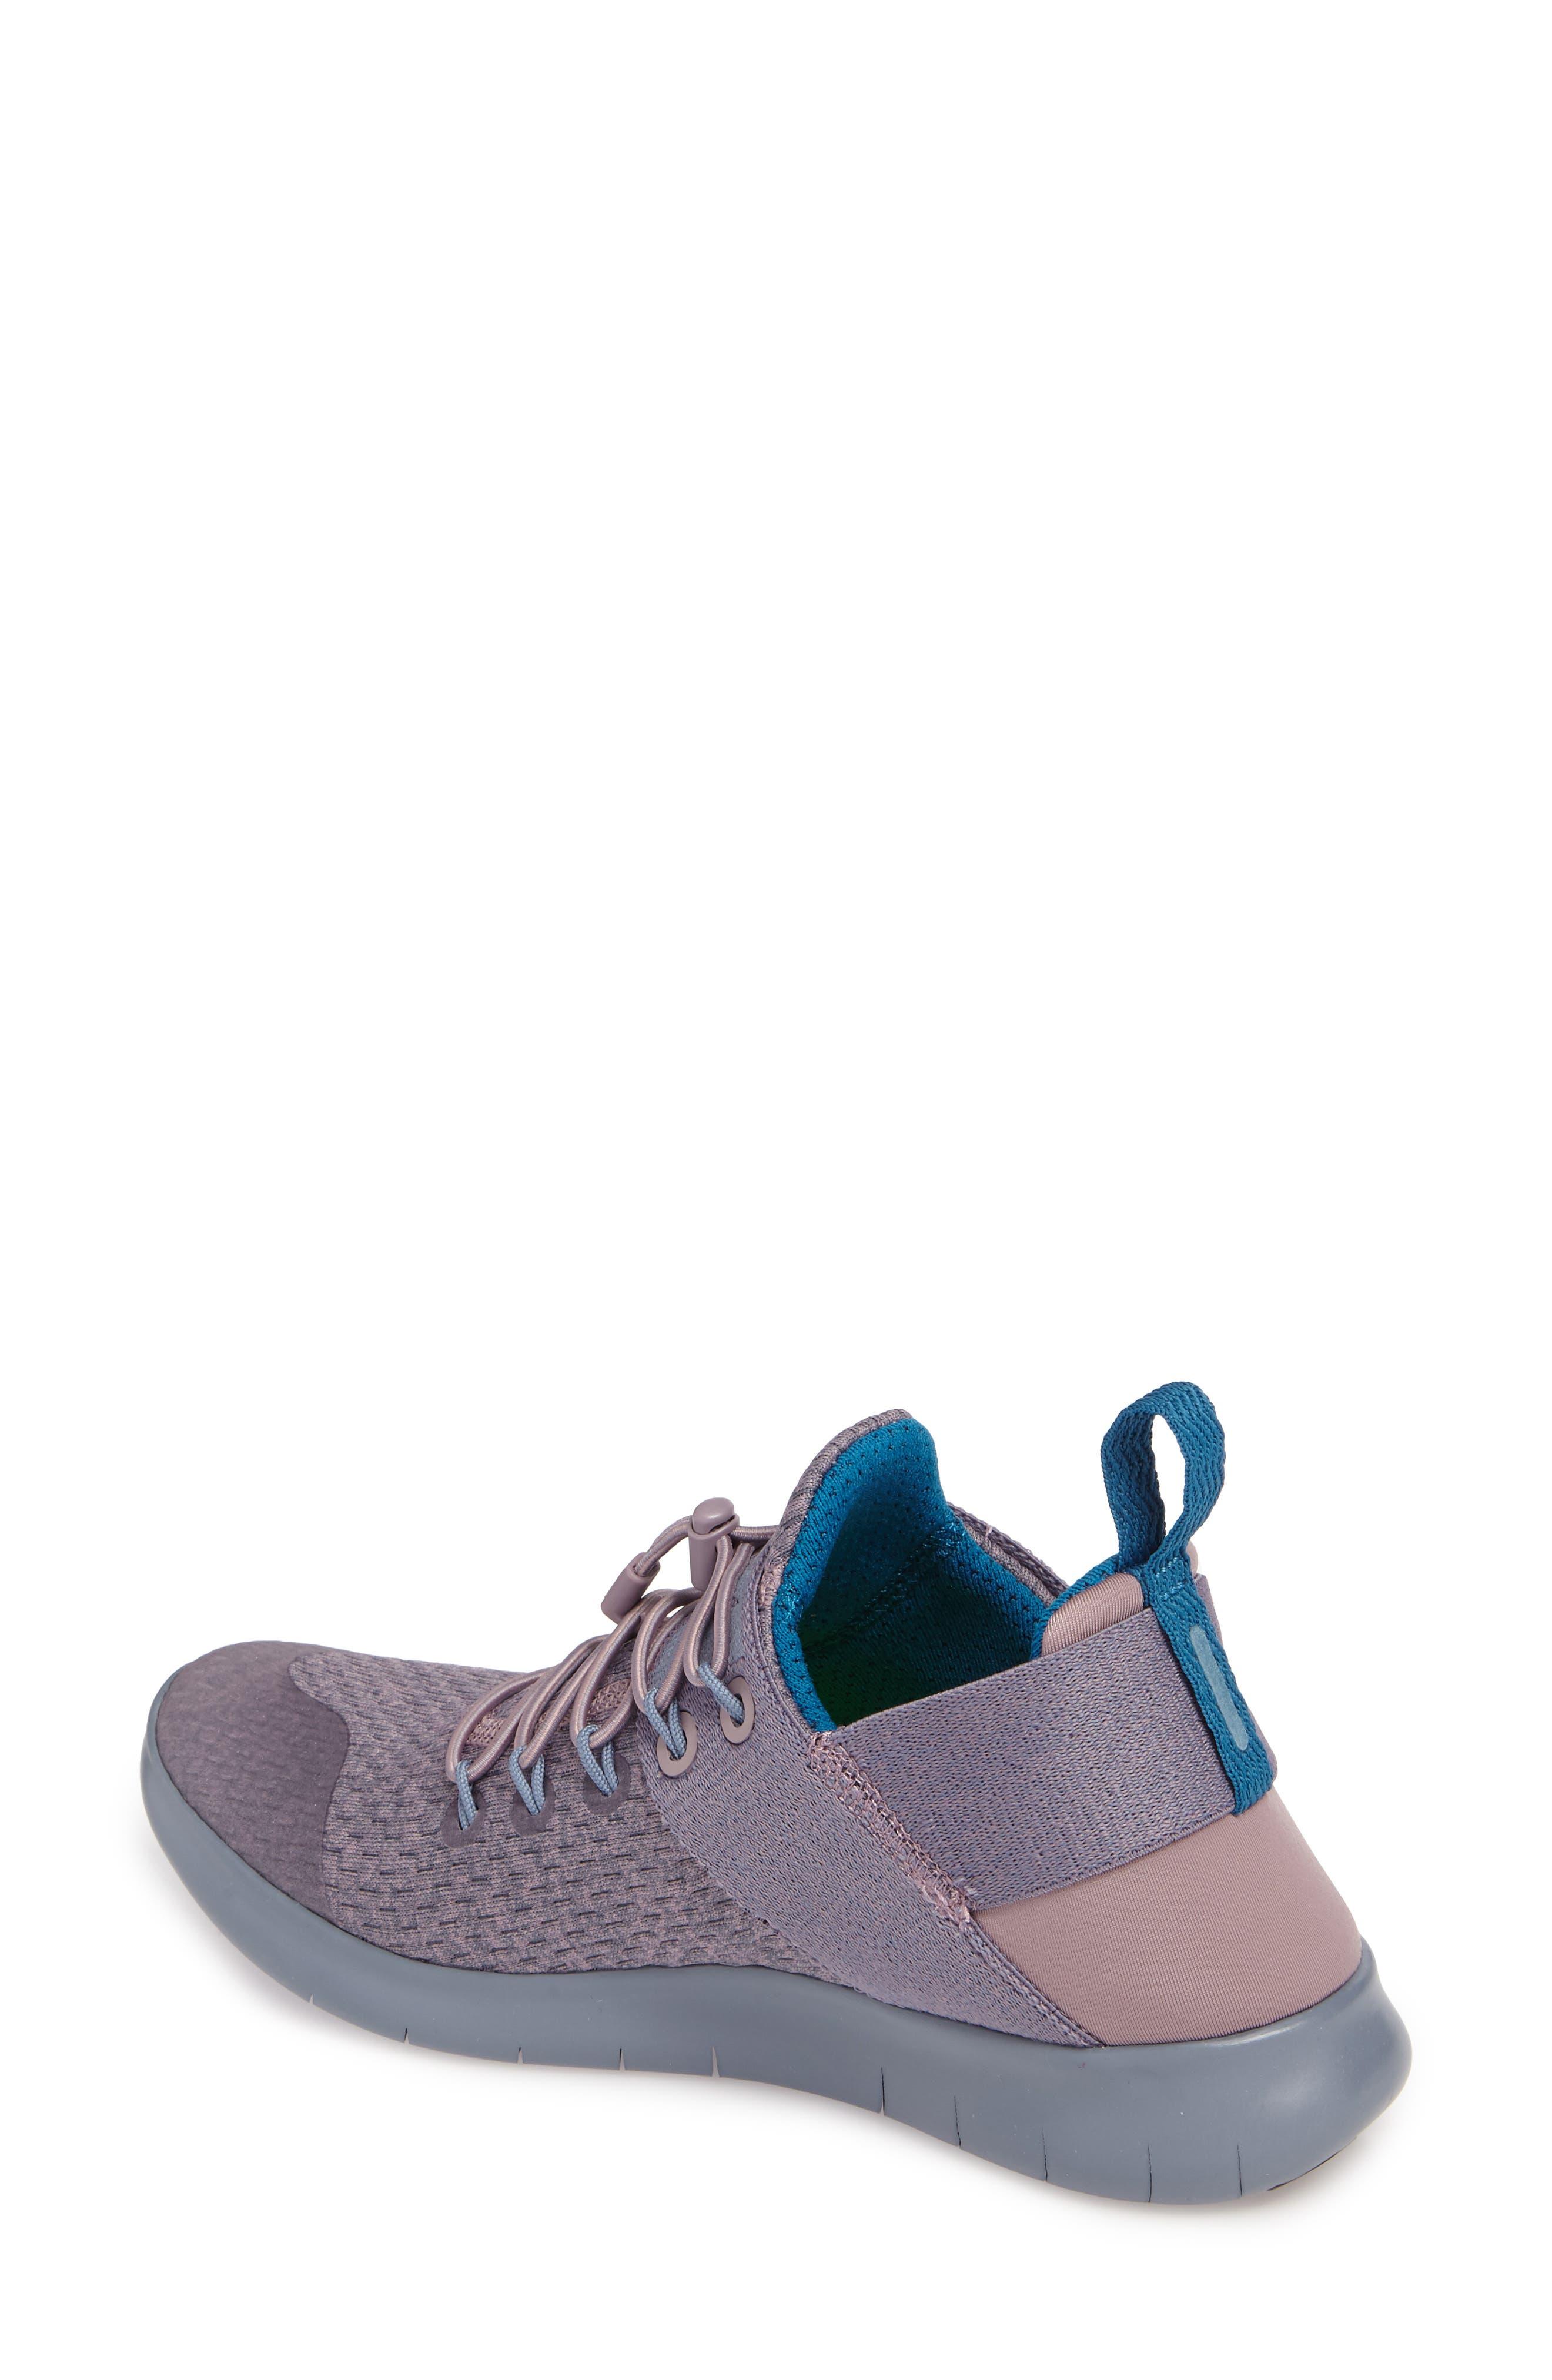 Free RN Commuter 2017 Premium Running Shoe,                             Alternate thumbnail 5, color,